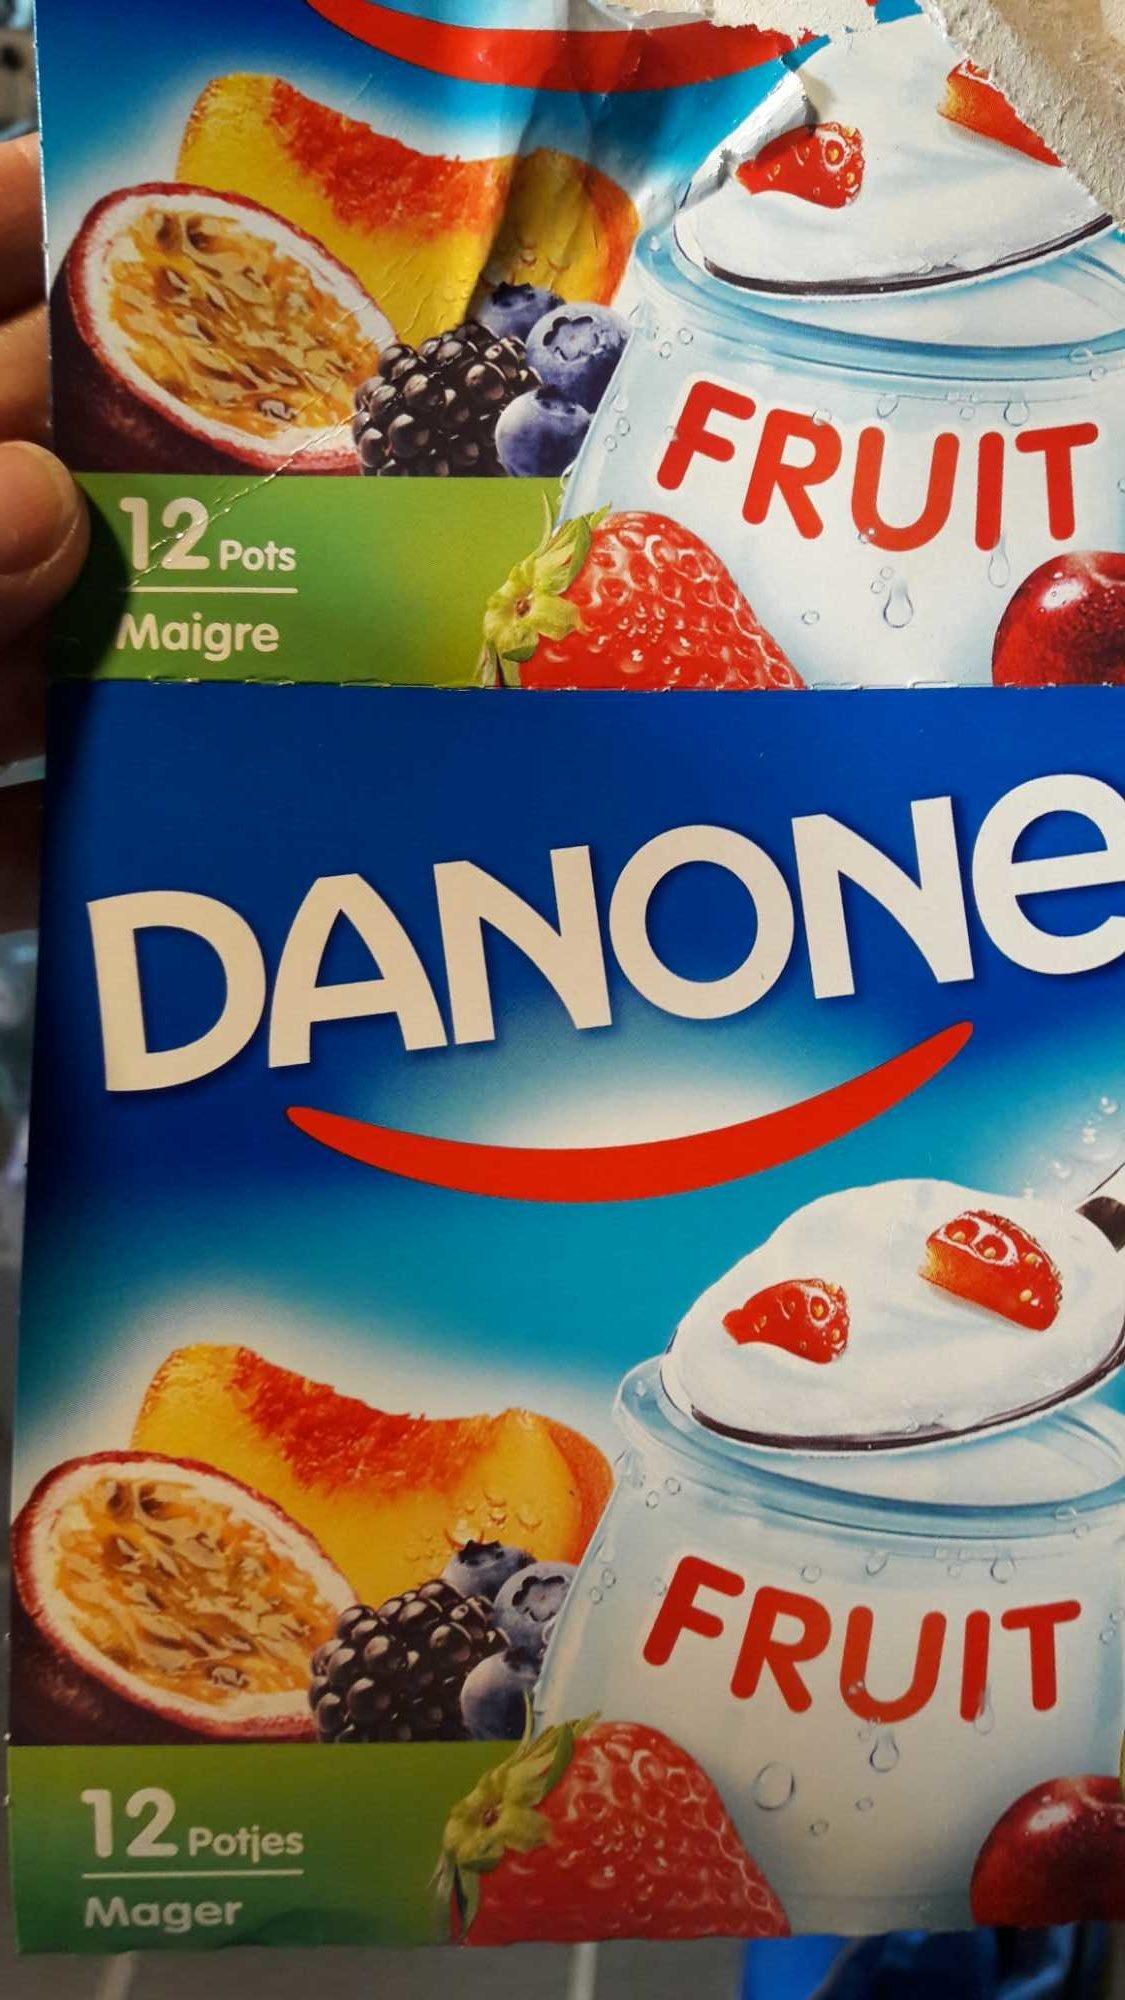 Danone fruits maigre - Produit - fr